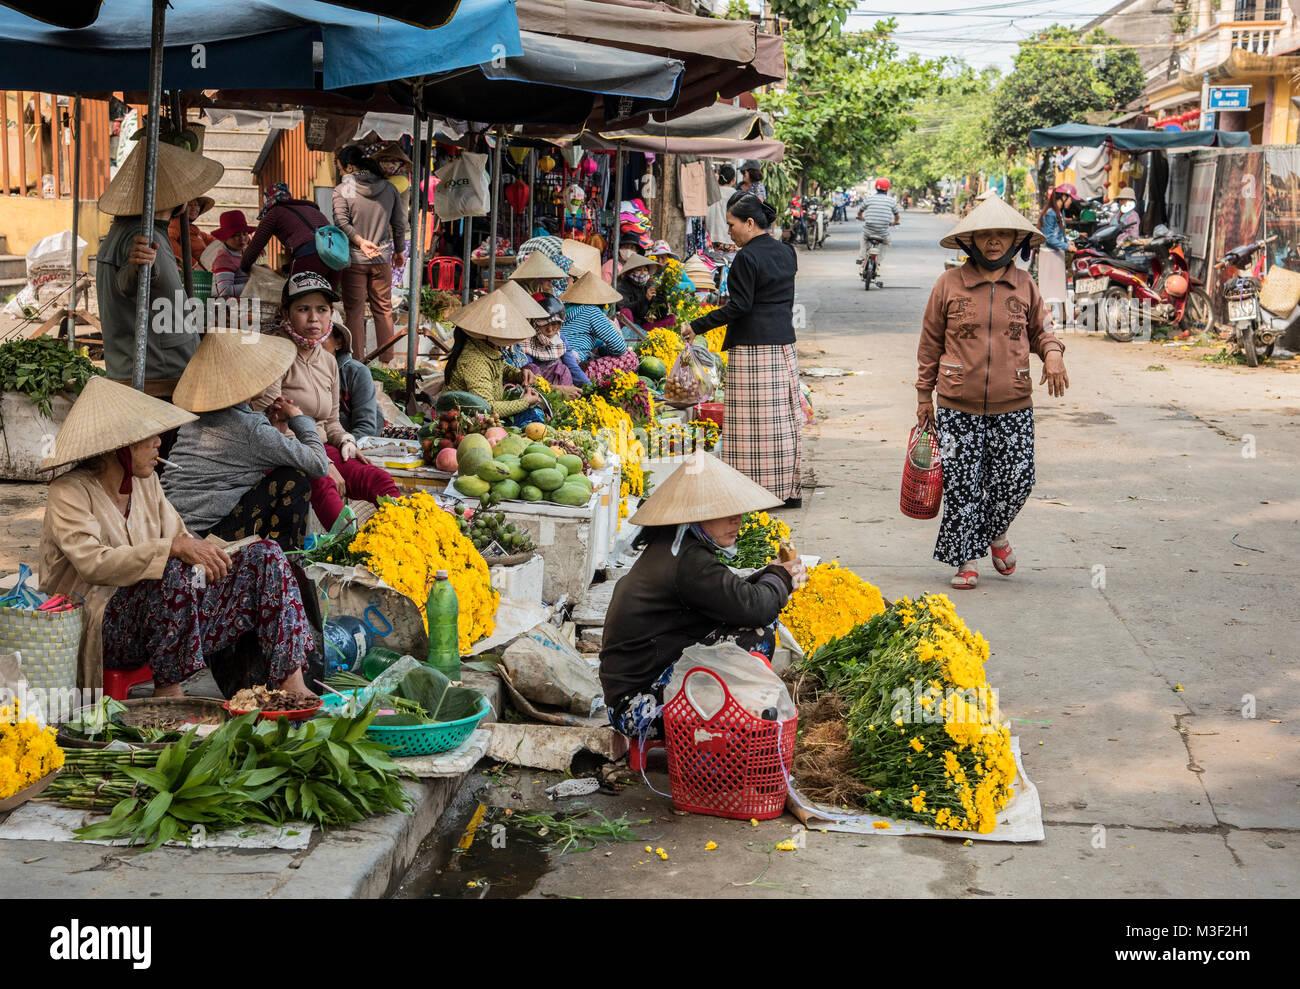 Mercadillo tradicional vietnamita en Hoi An Vietnam sitio patrimonio  mundial de la Unesco. Imagen De 48499b4e177